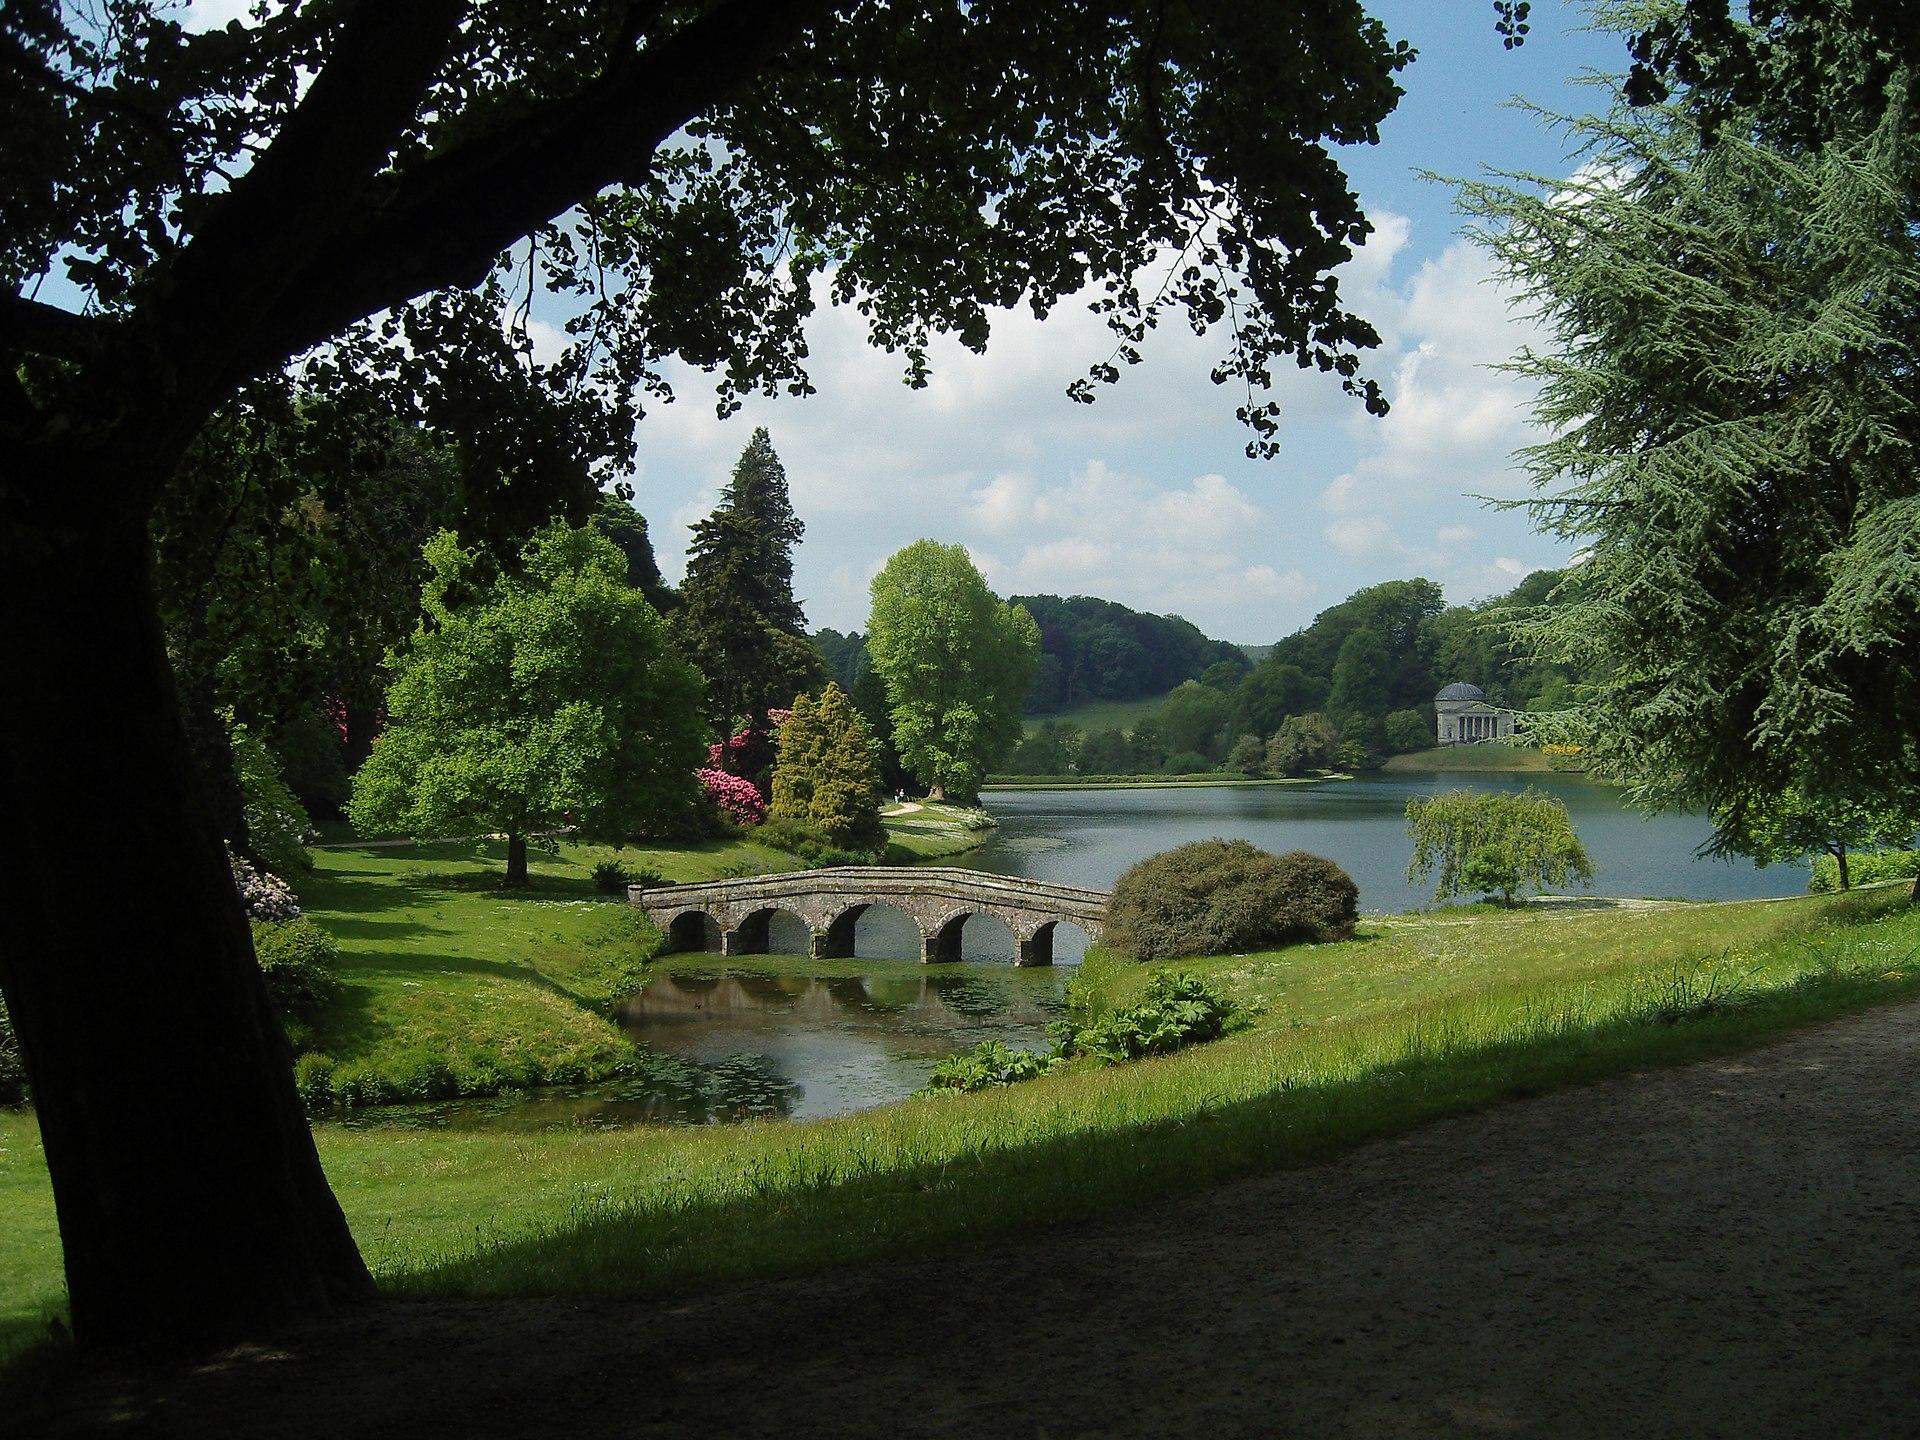 Jardin l 39 anglaise wikip dia for Jardin 0 l4anglaise